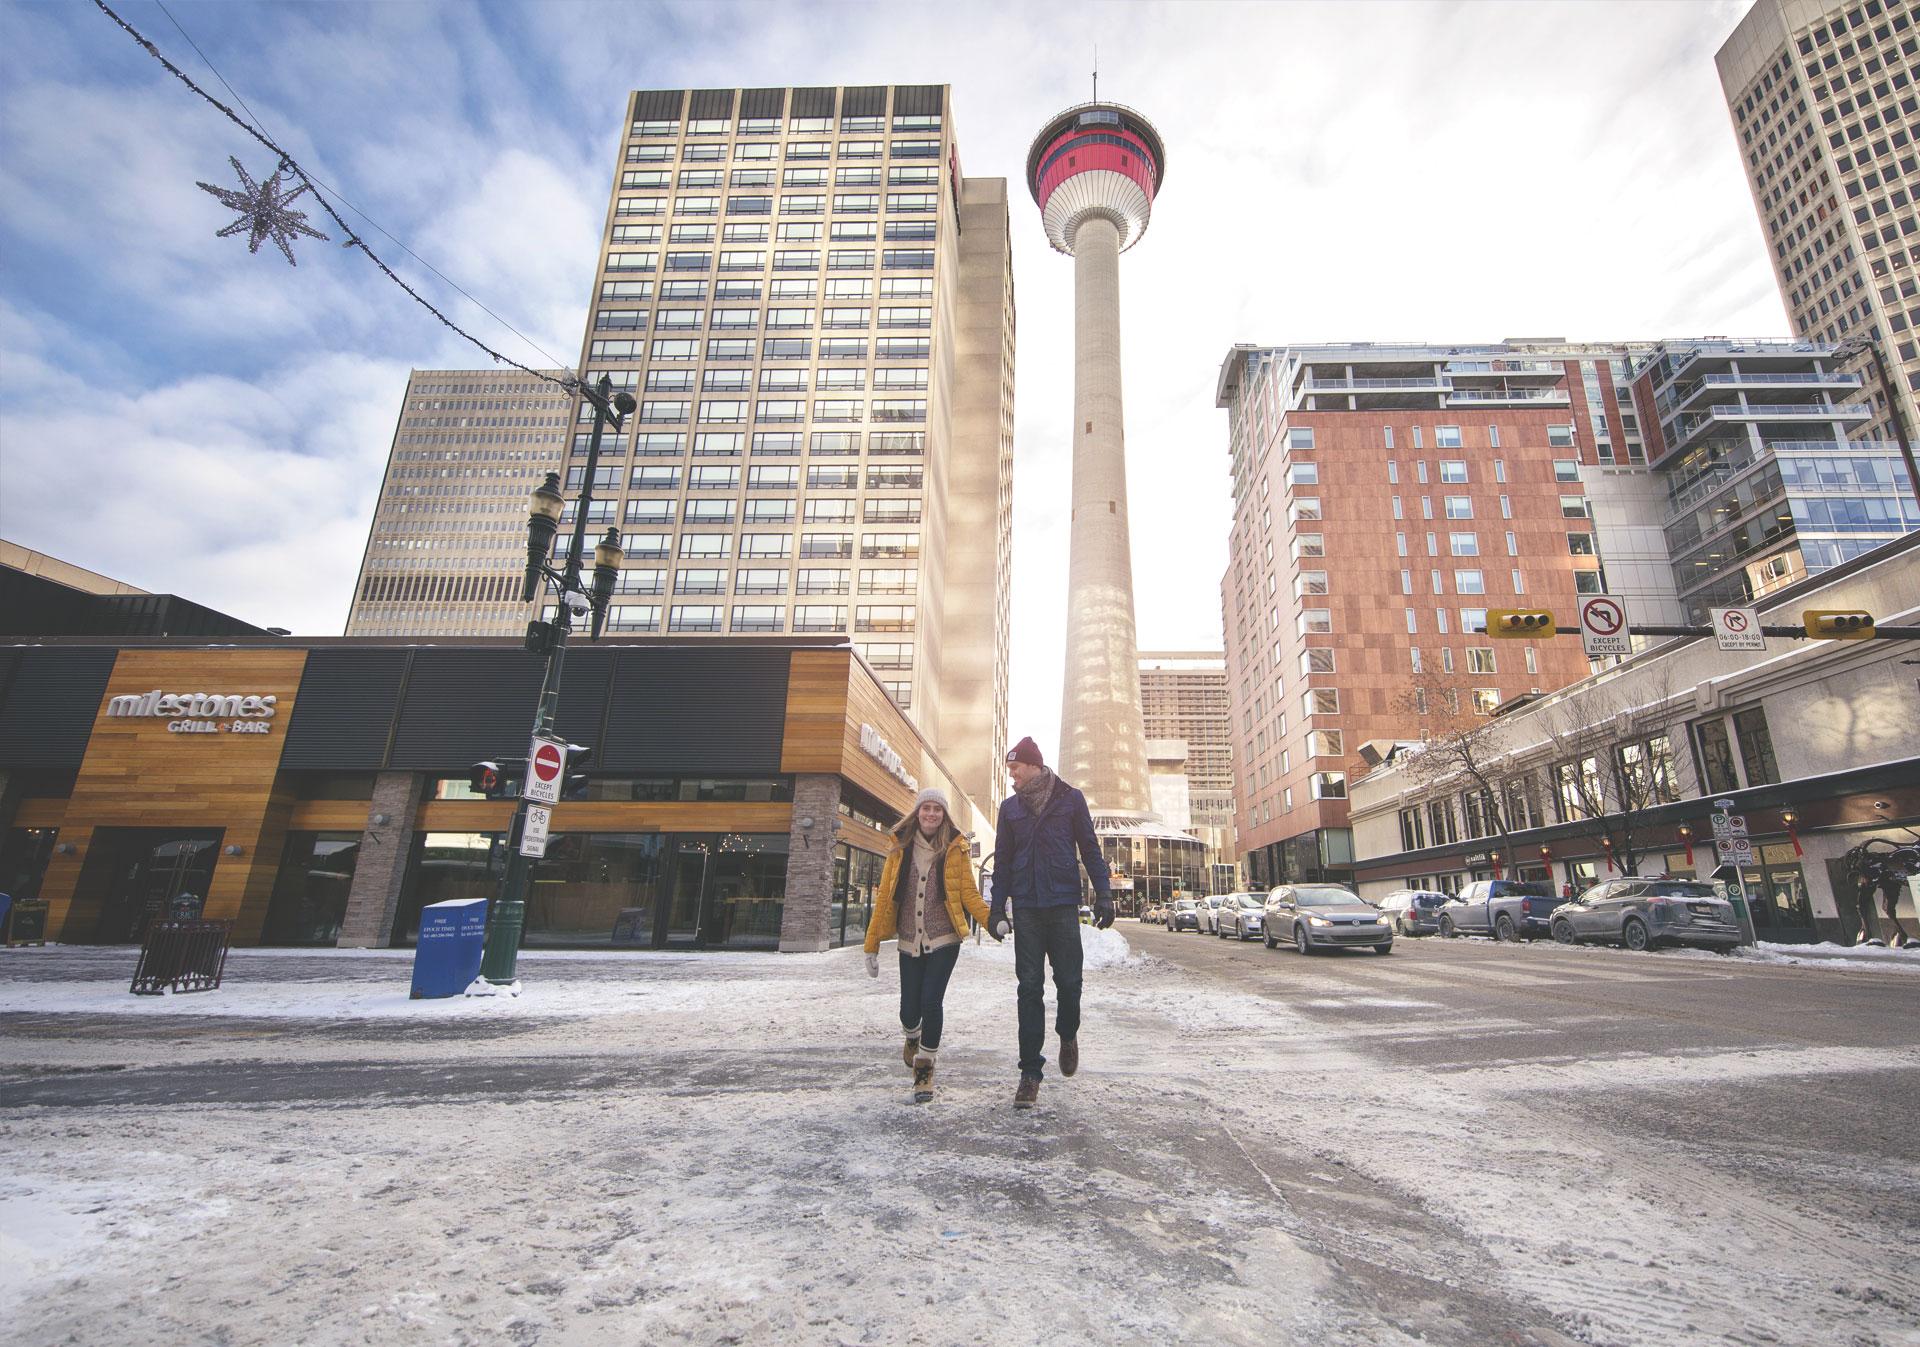 Walking_In_Calgary_Image_Full_Width_003_20181106